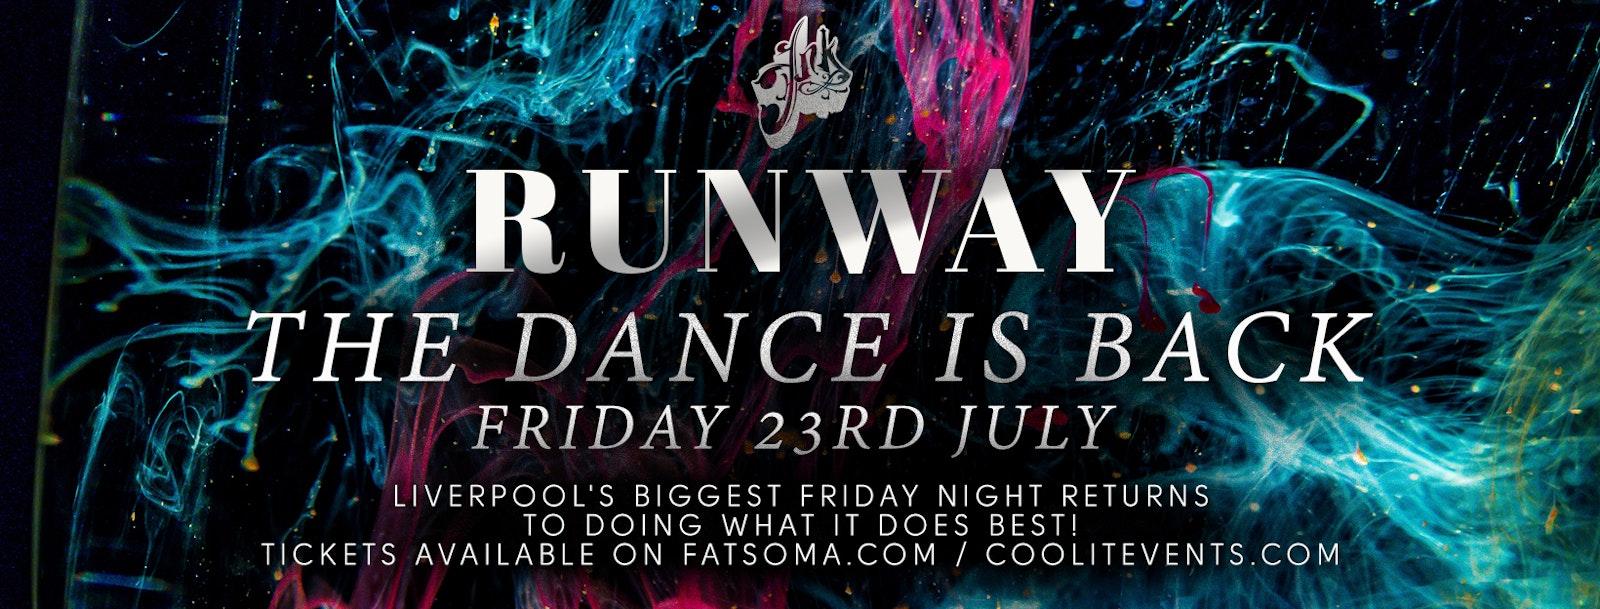 Runway Fridays Full Reopening Party